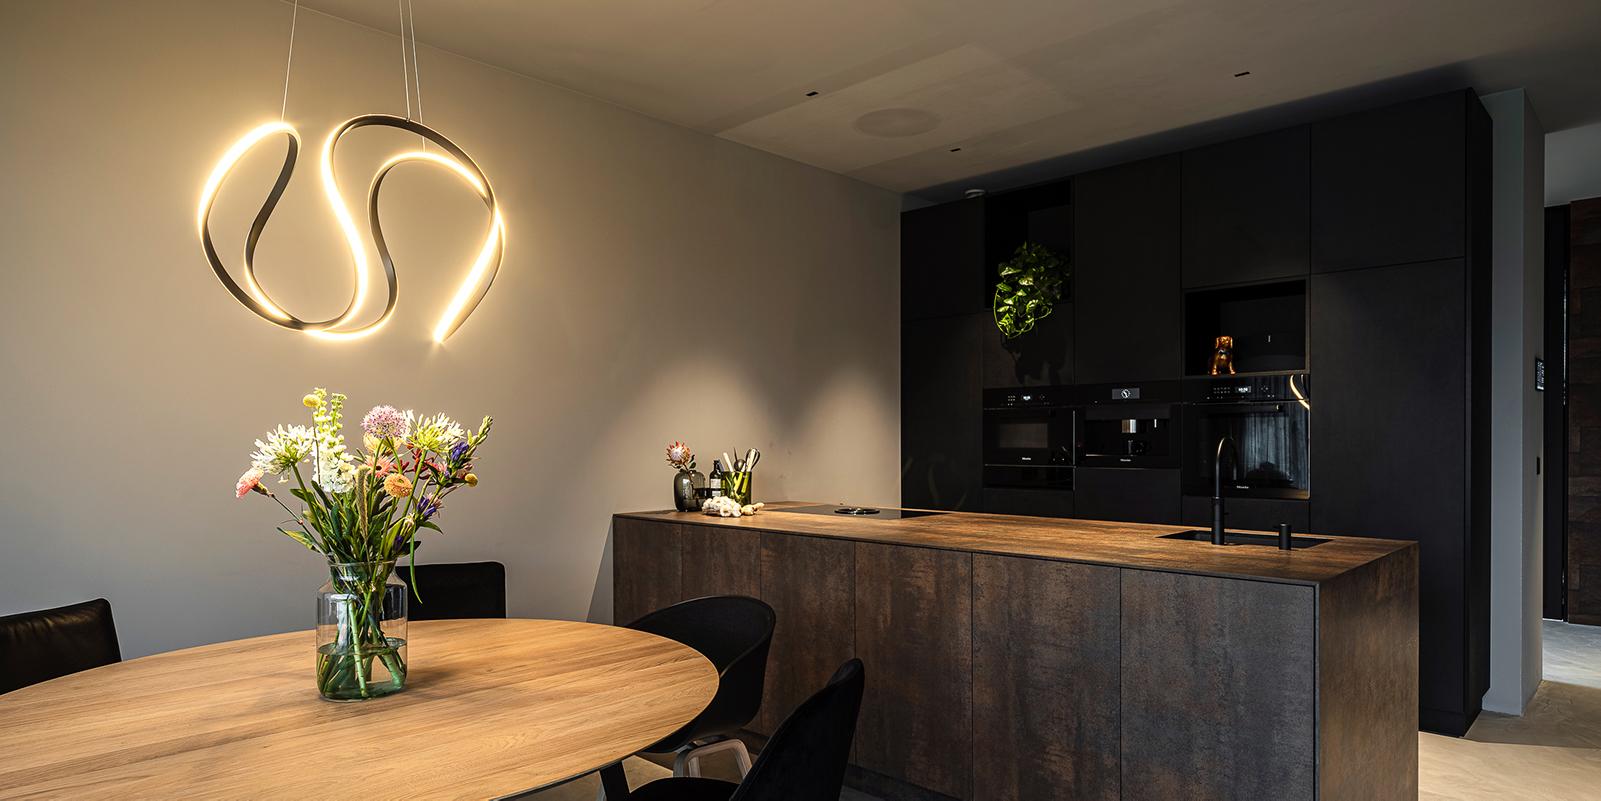 Donkere keuken, van essen keukens, the art of living